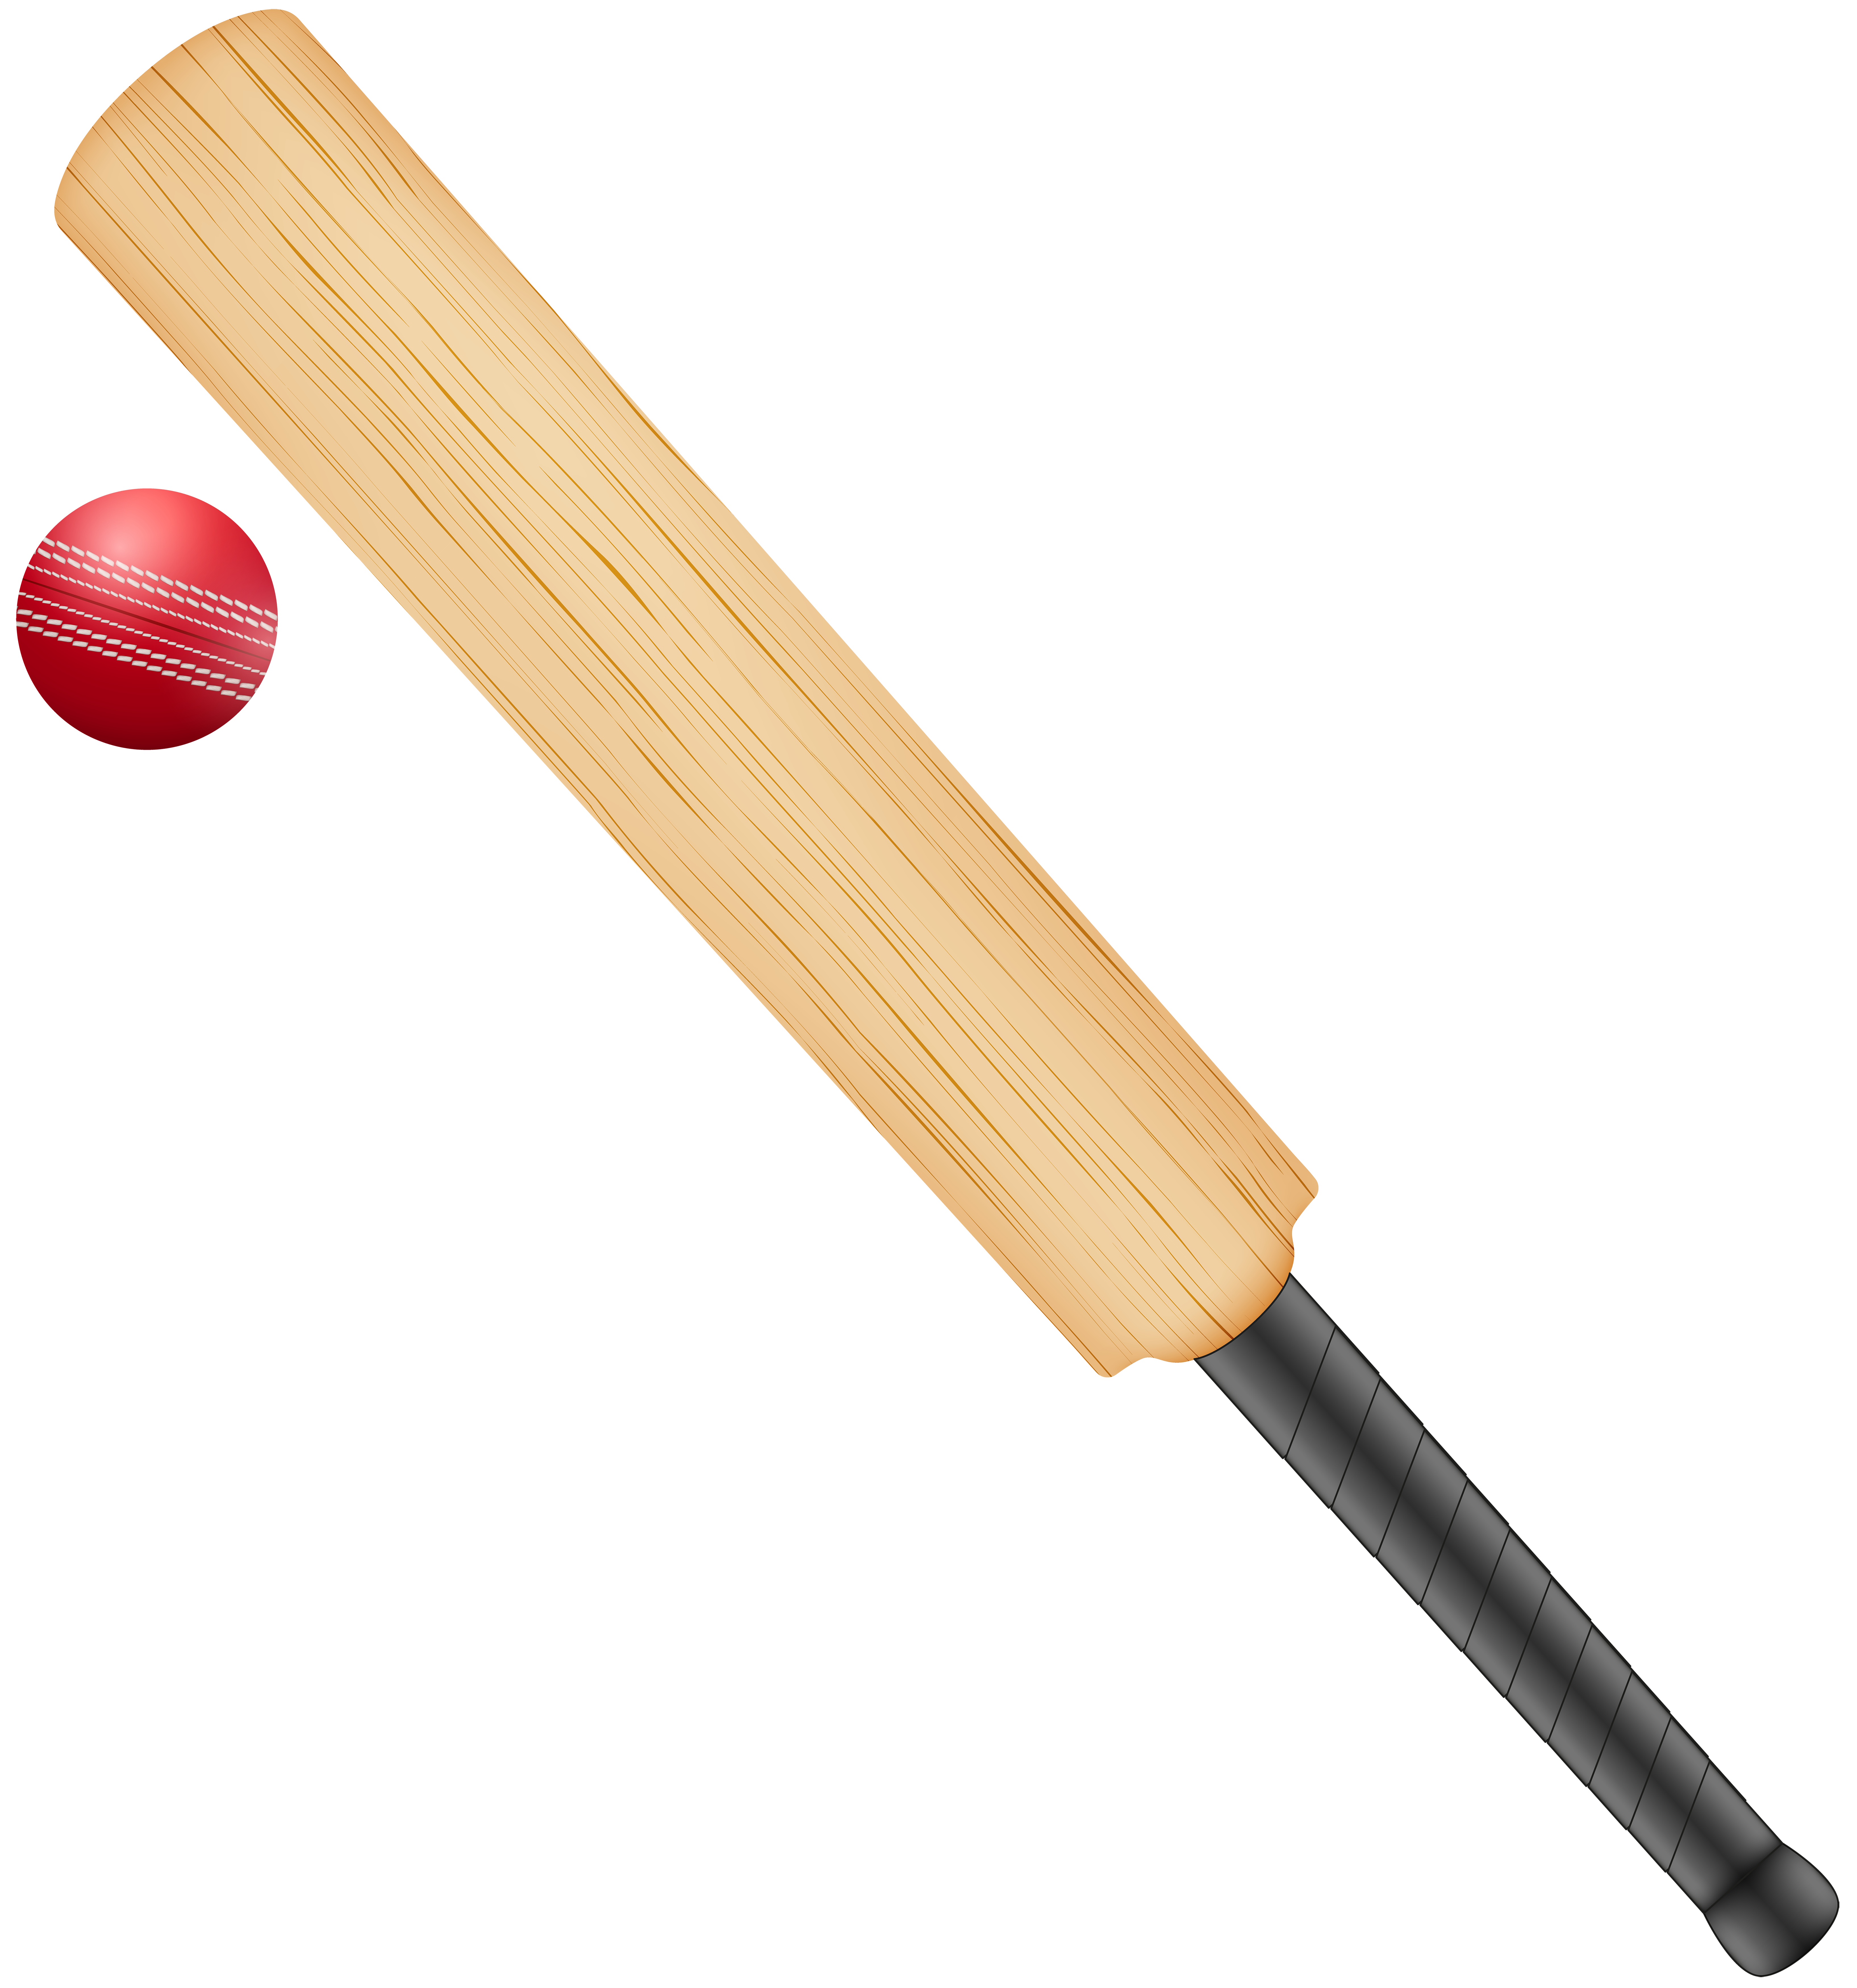 Baseball jersey clipart clipart royalty free stock Cricket Set Transparent PNG Clip Art | Gallery Yopriceville - High ... clipart royalty free stock